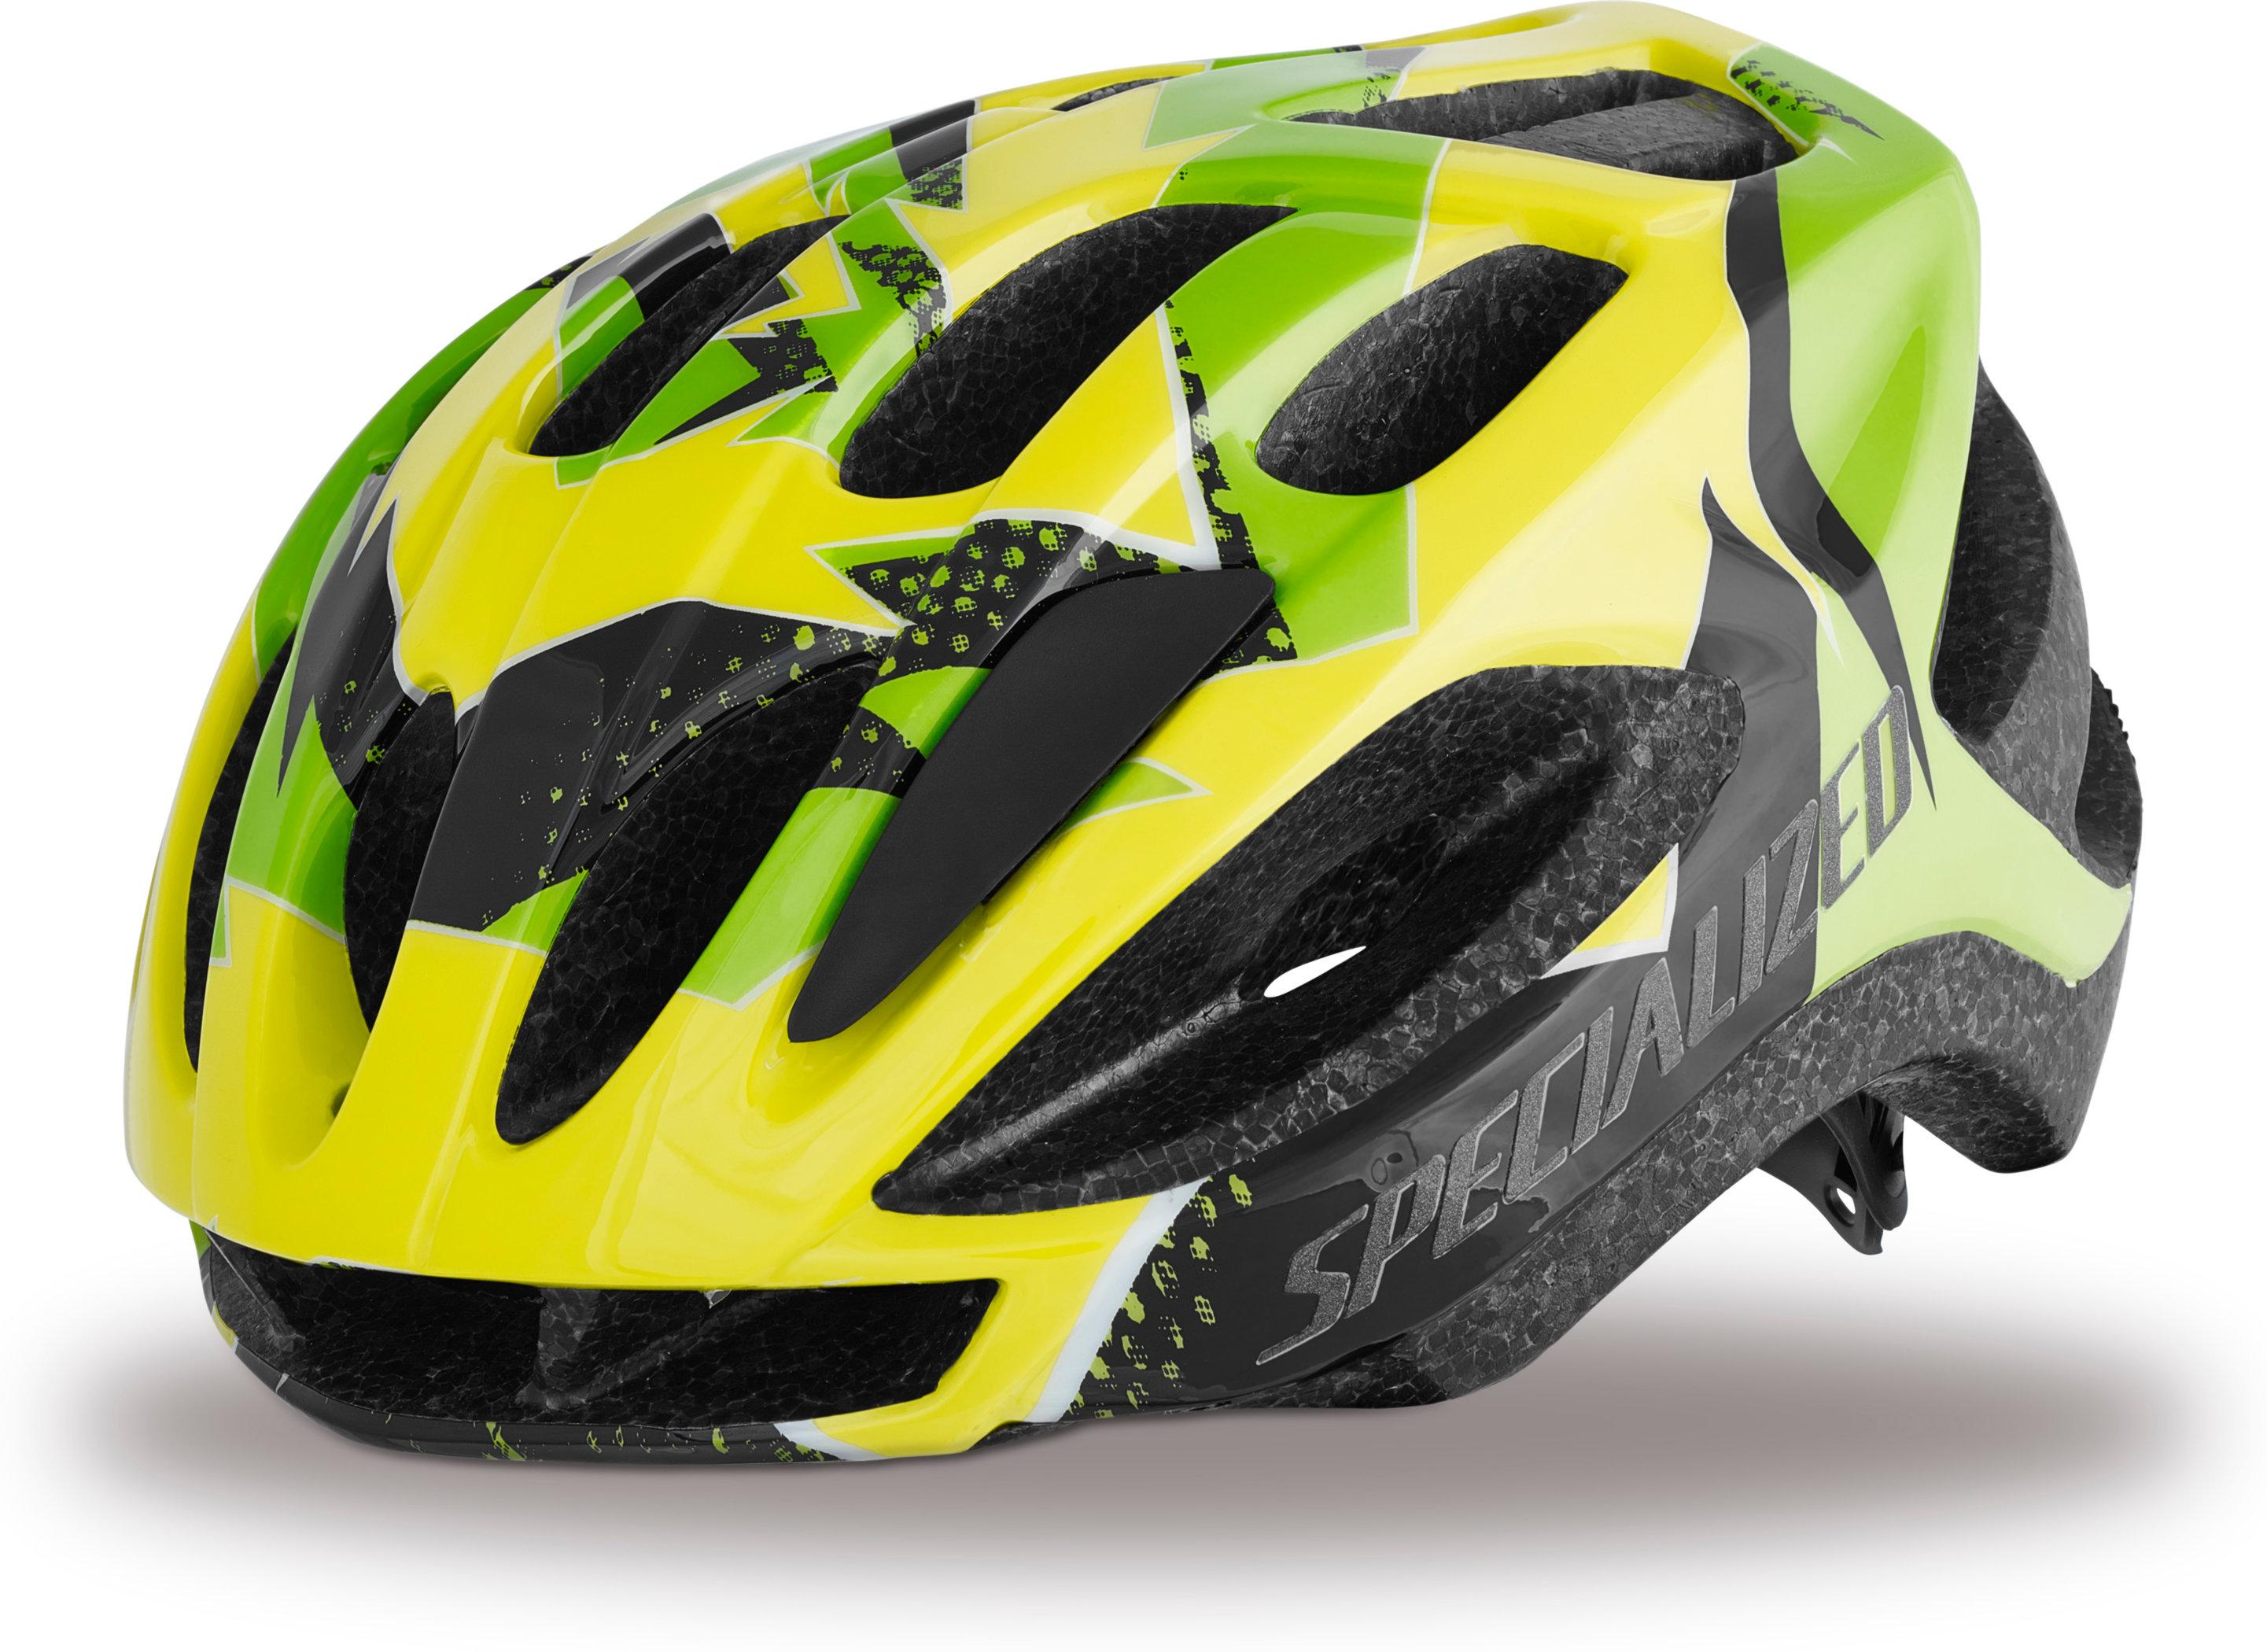 SPECIALIZED FLASH HLMT CE HYP GRN HURRICANE YTH - Pulsschlag Bike+Sport